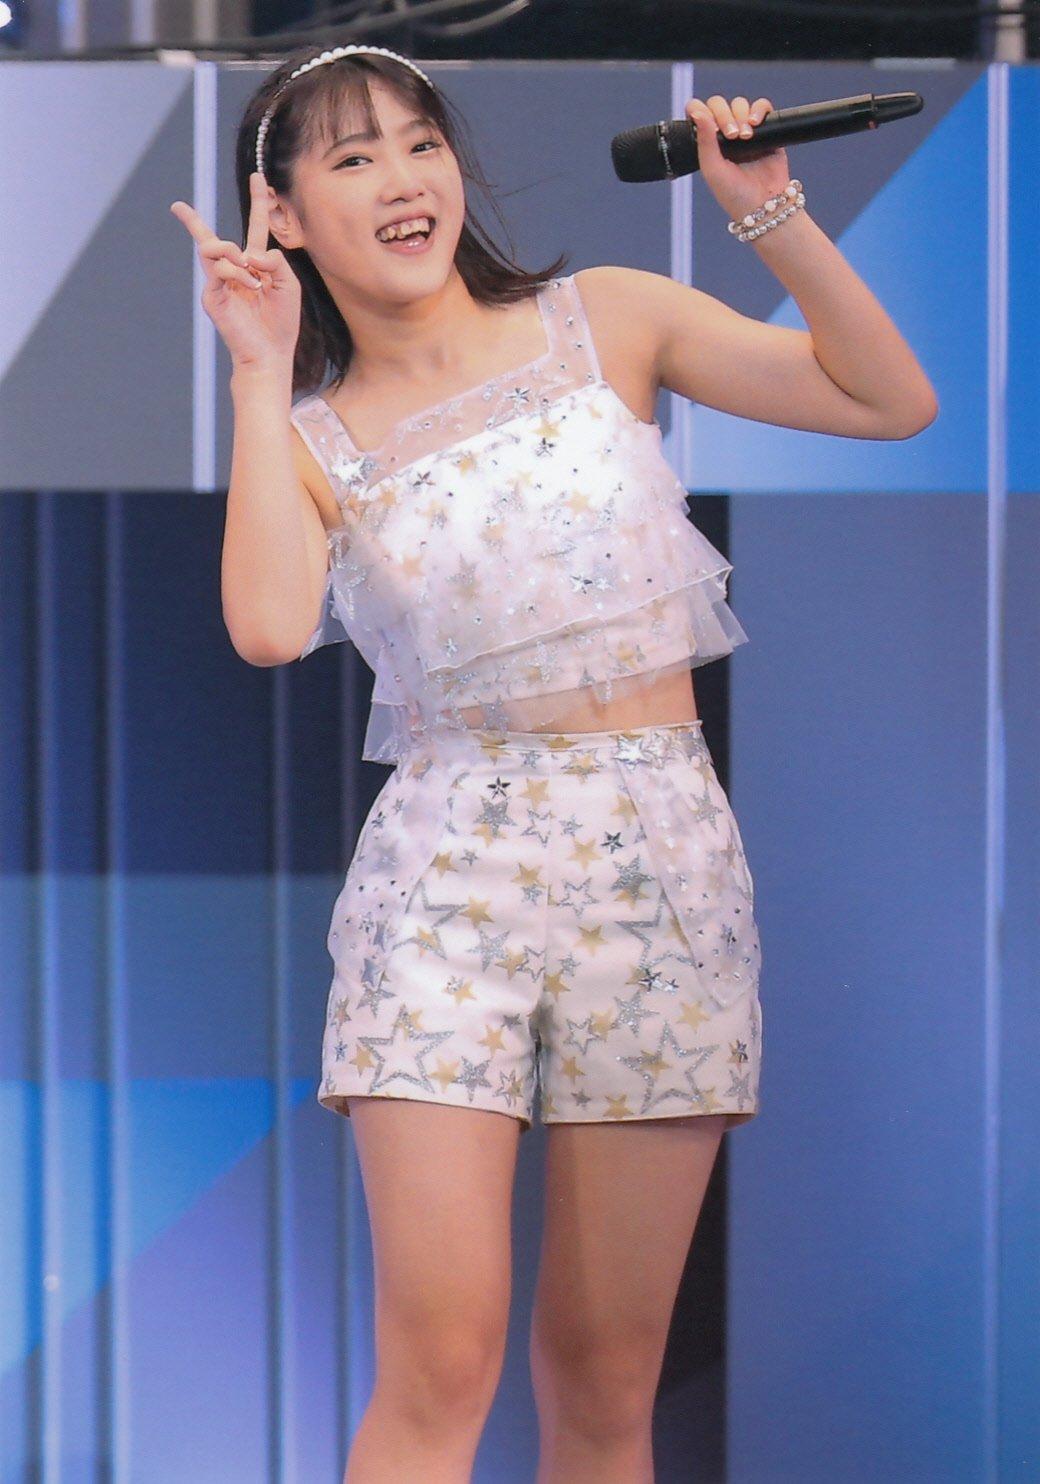 Concert, Country Girls (カントリー・ガールズ), Ozeki Mai (小関舞)